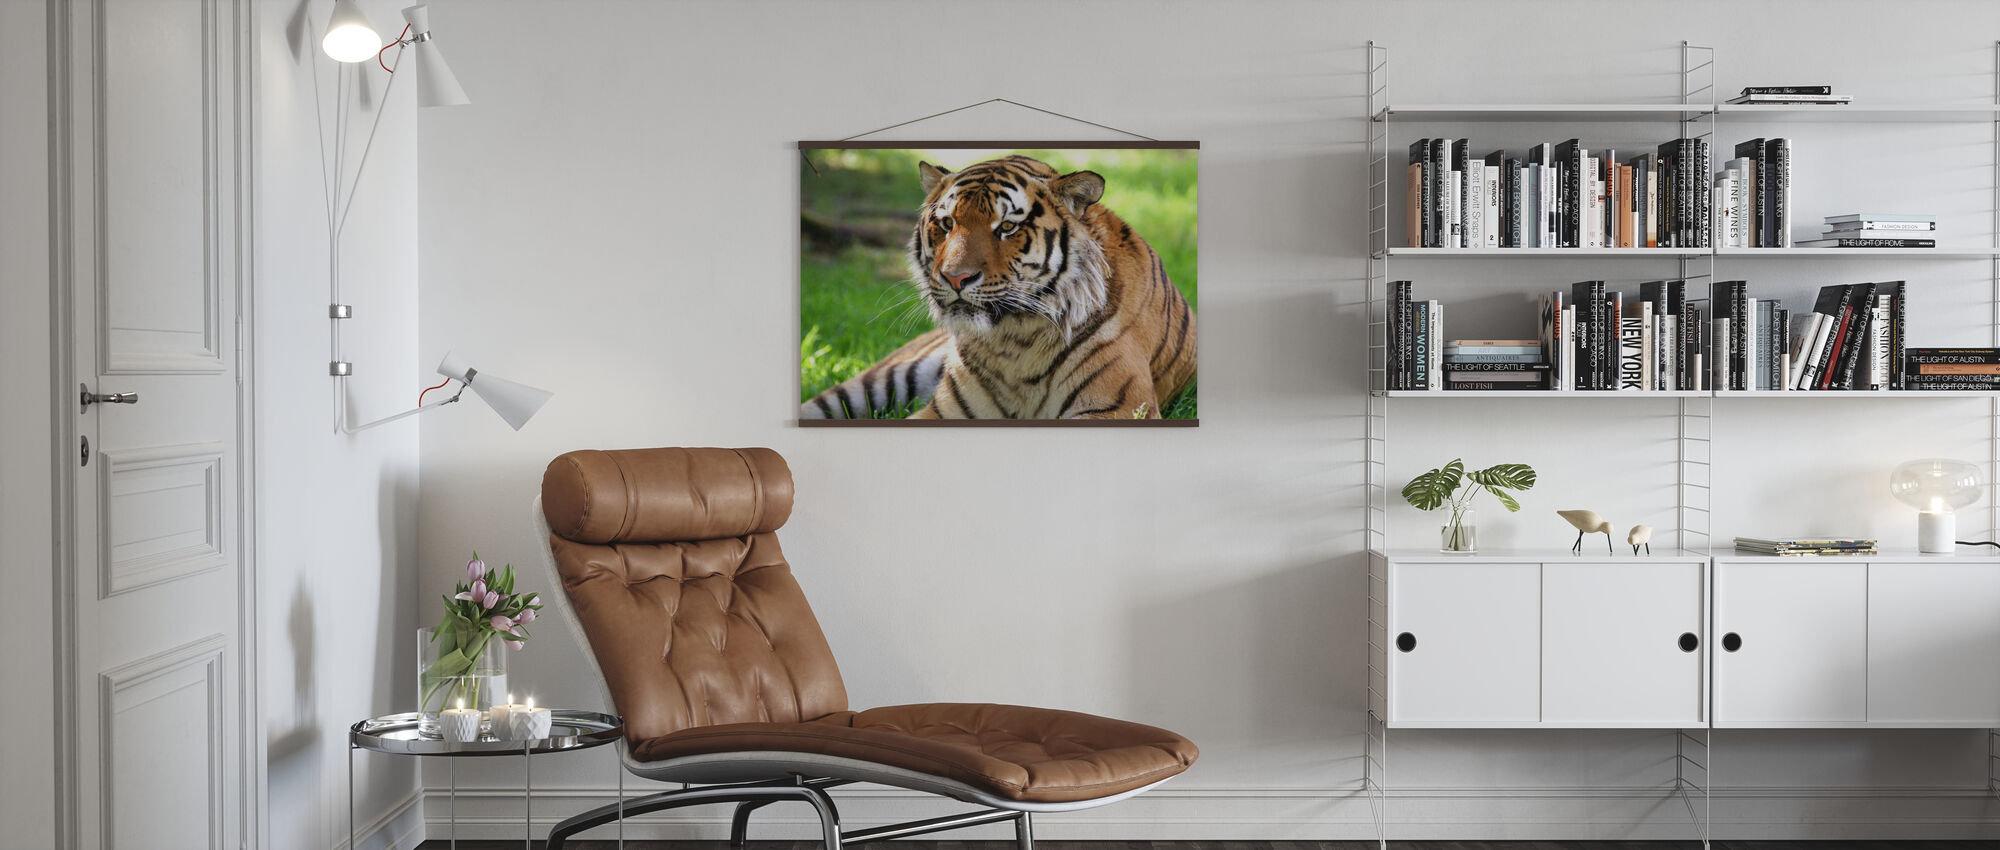 Tiikeri - Juliste - Olohuone